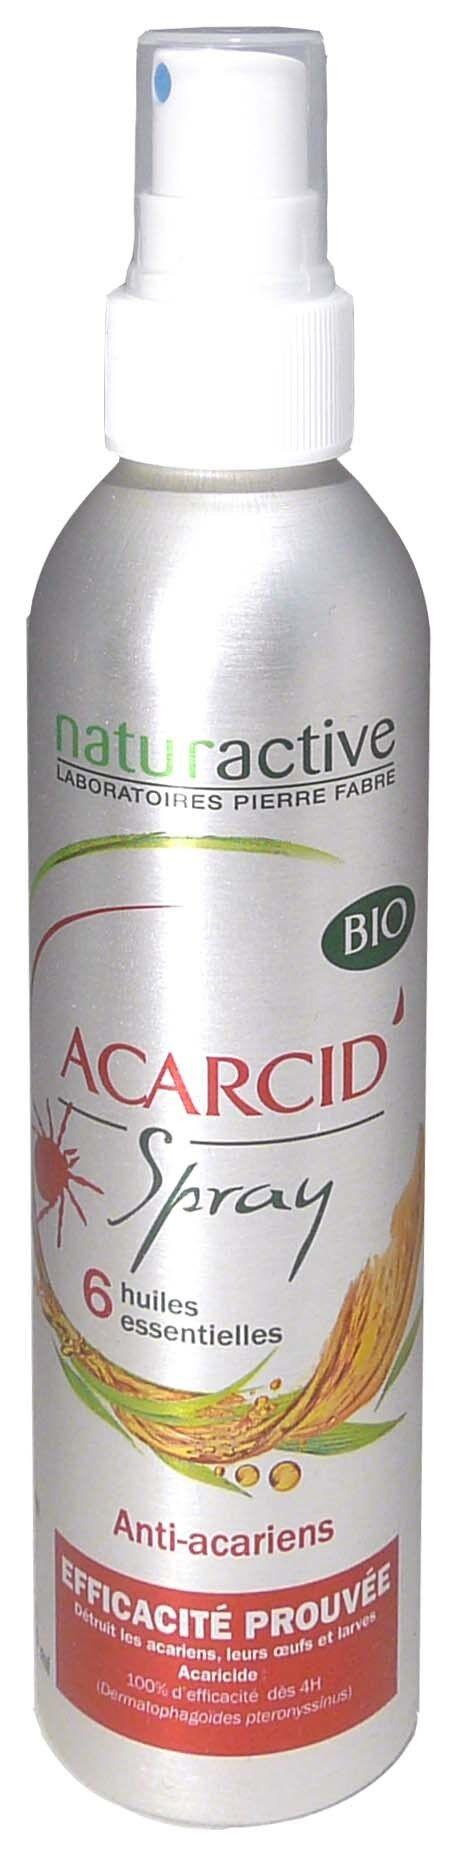 Naturactive acarcid' spray bio 200ml